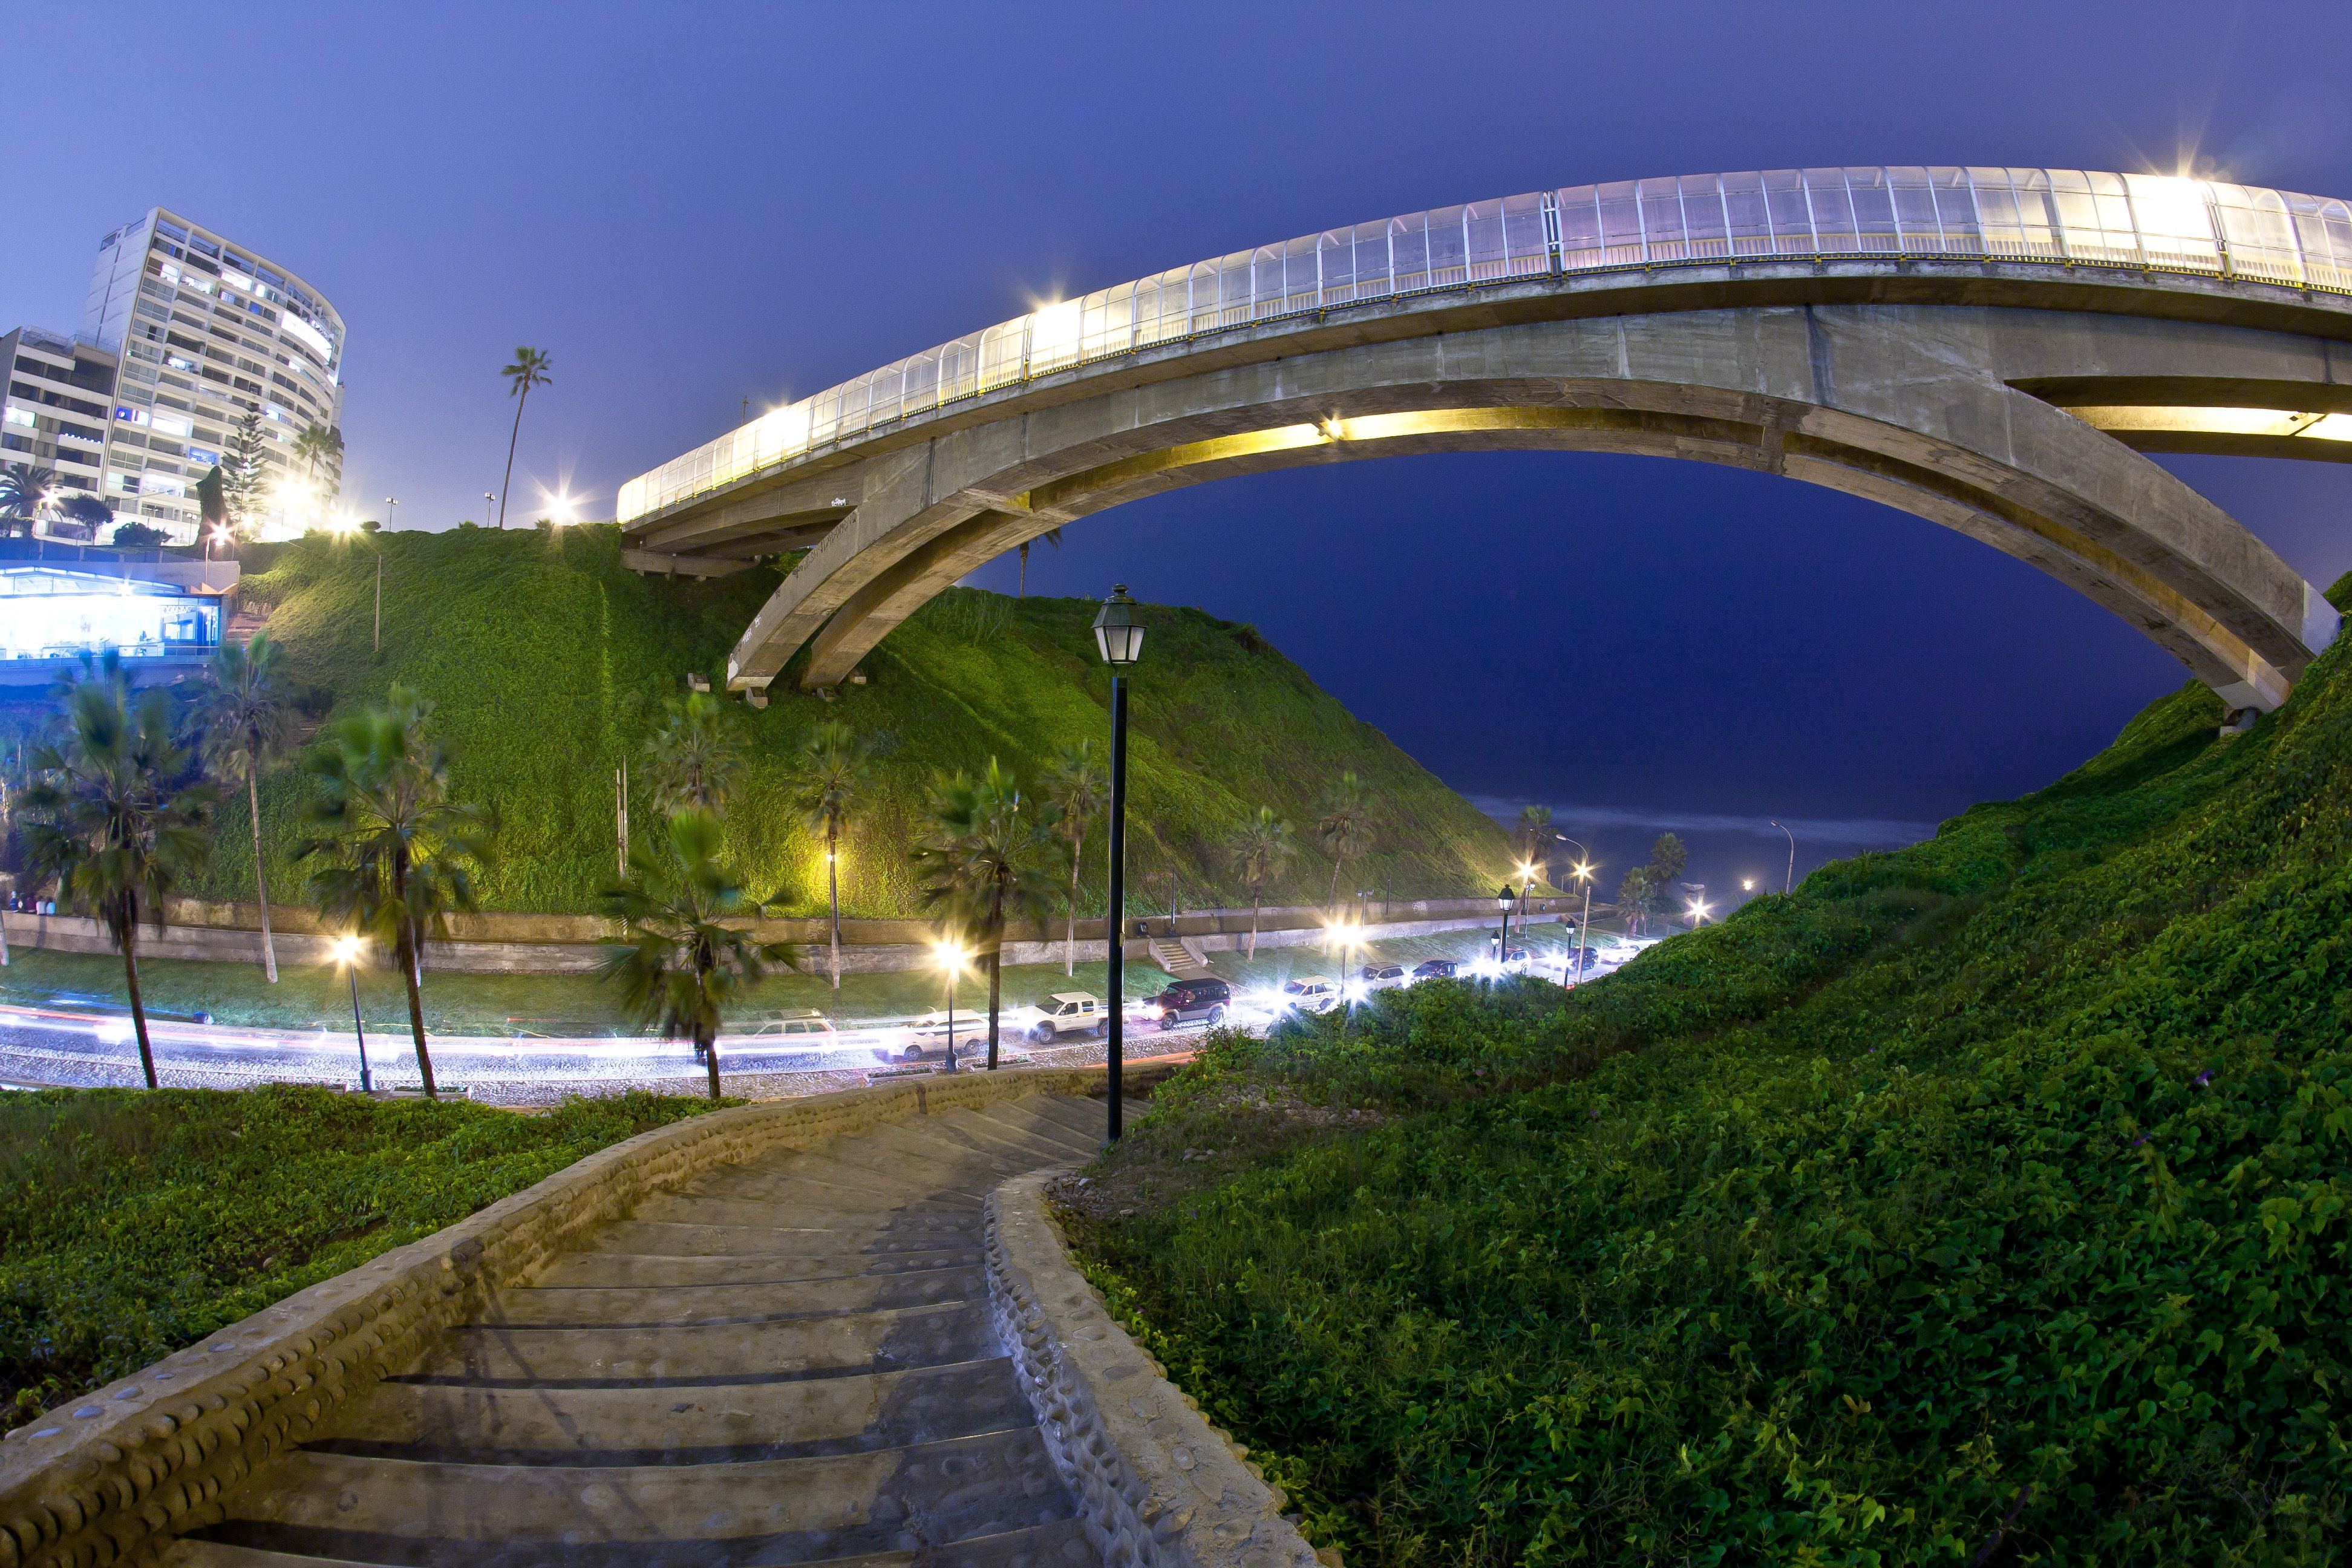 Villena bridge in miraflores,Lima Peru This is the city where my ...